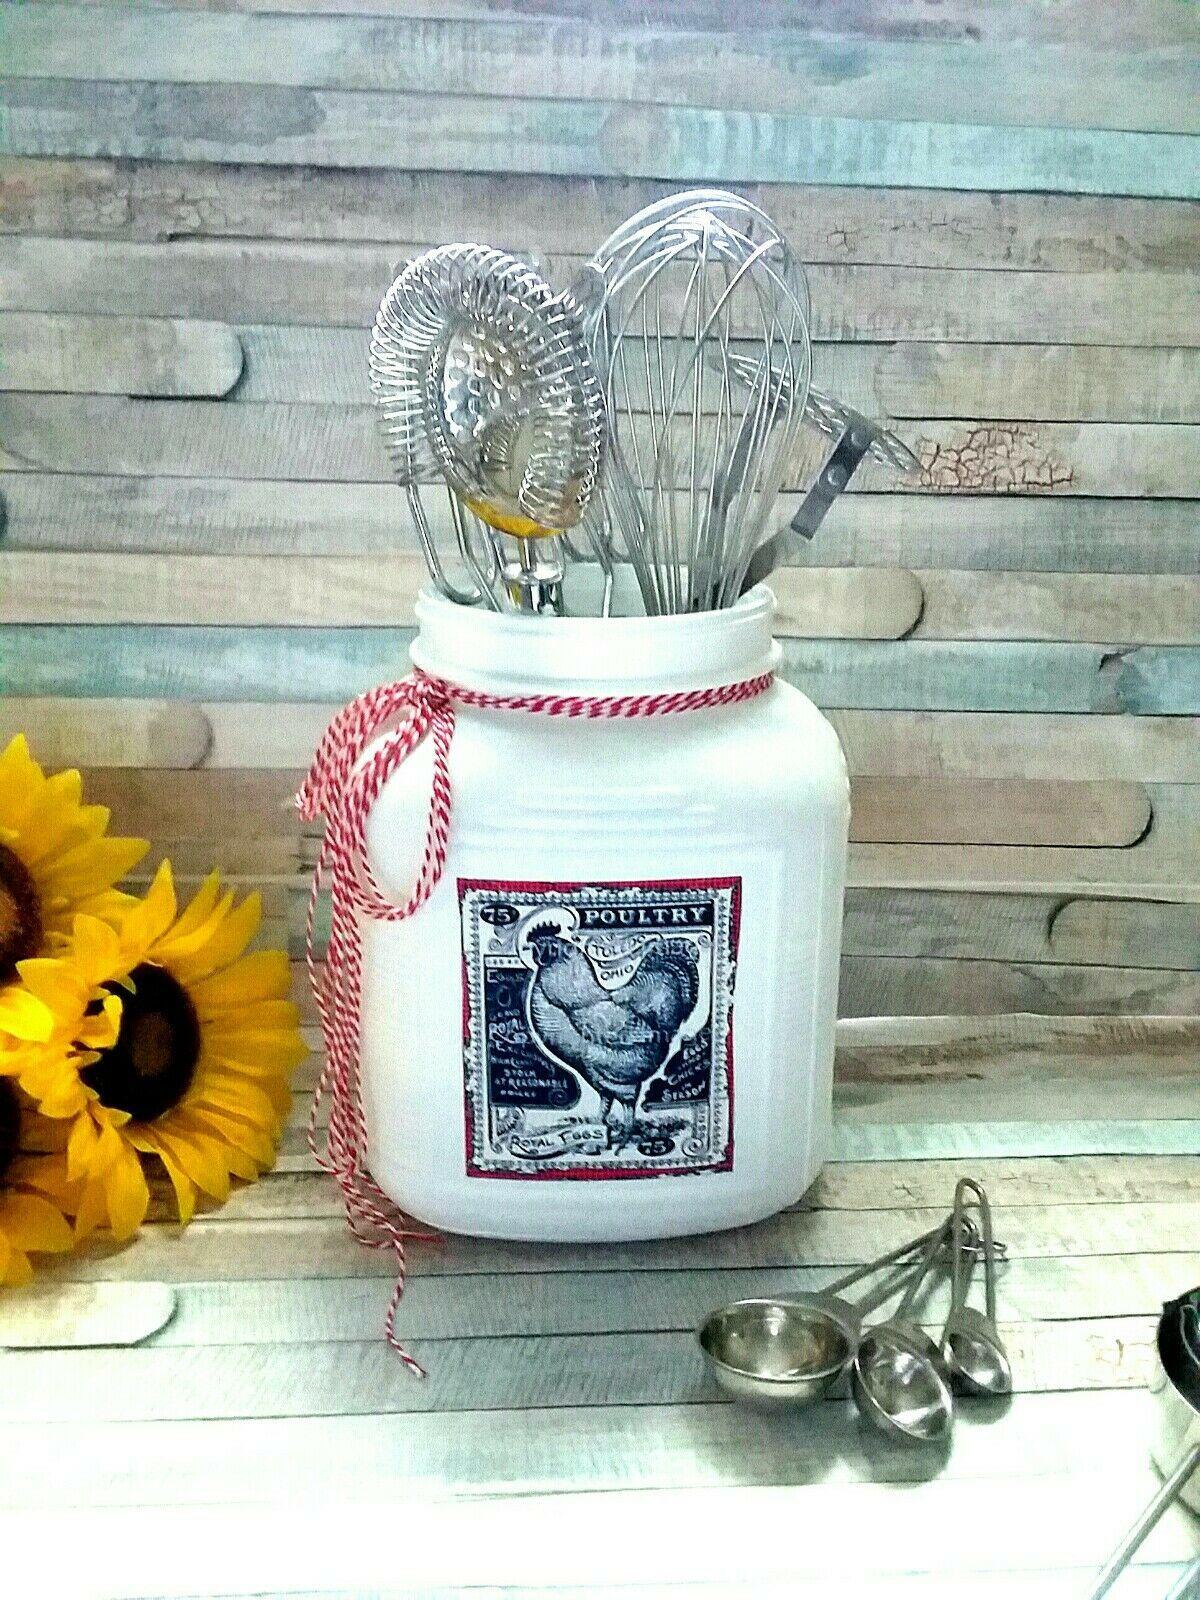 Flip Stir Whisk Utensil Holder Mason Jar Decor Kitchen